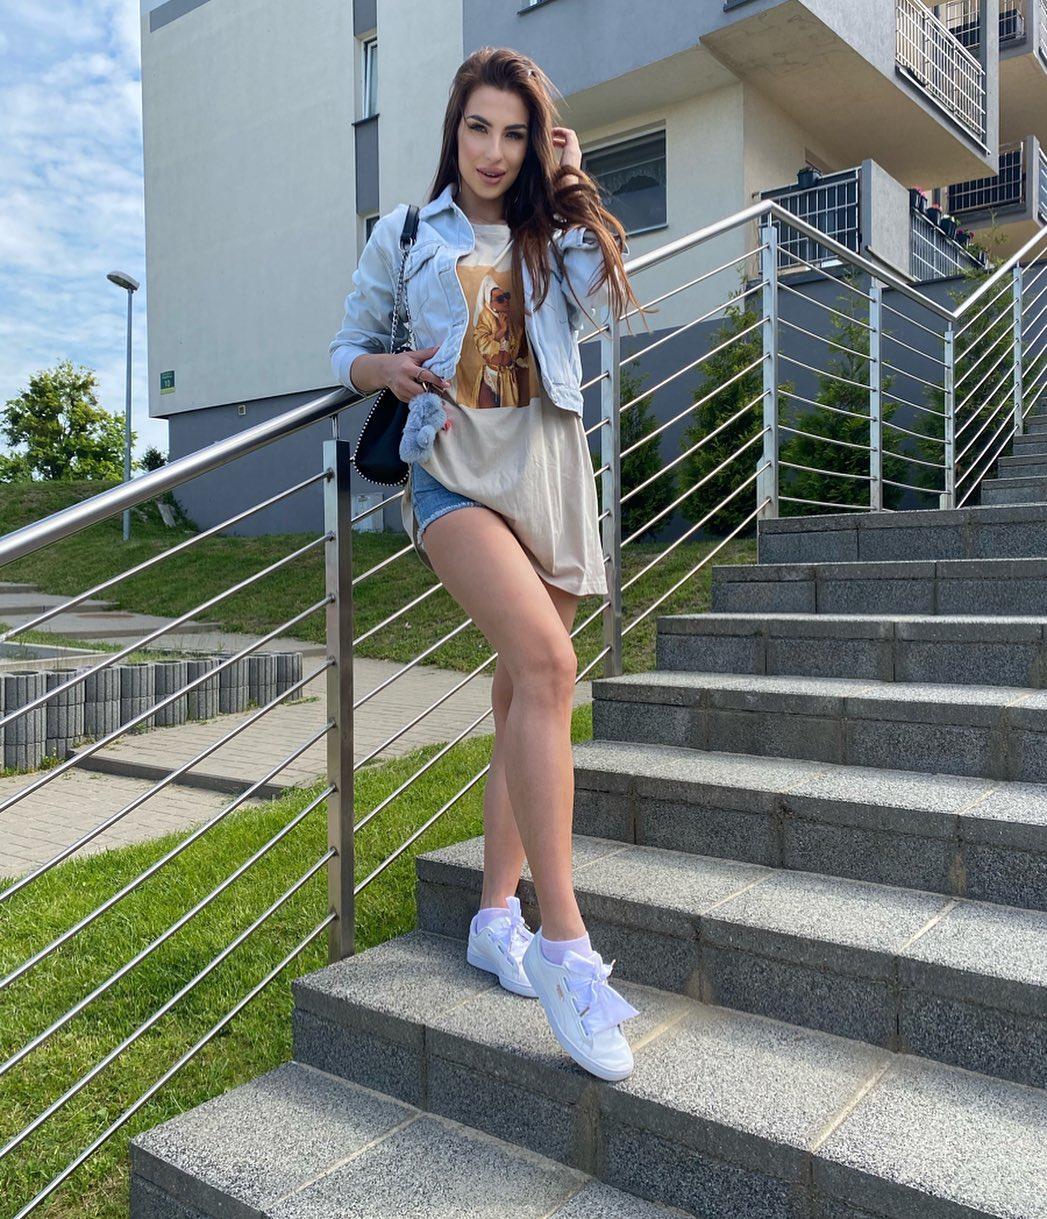 Adrianna-Gotowicka-Wallpapers-Insta-Fit-Bio-1